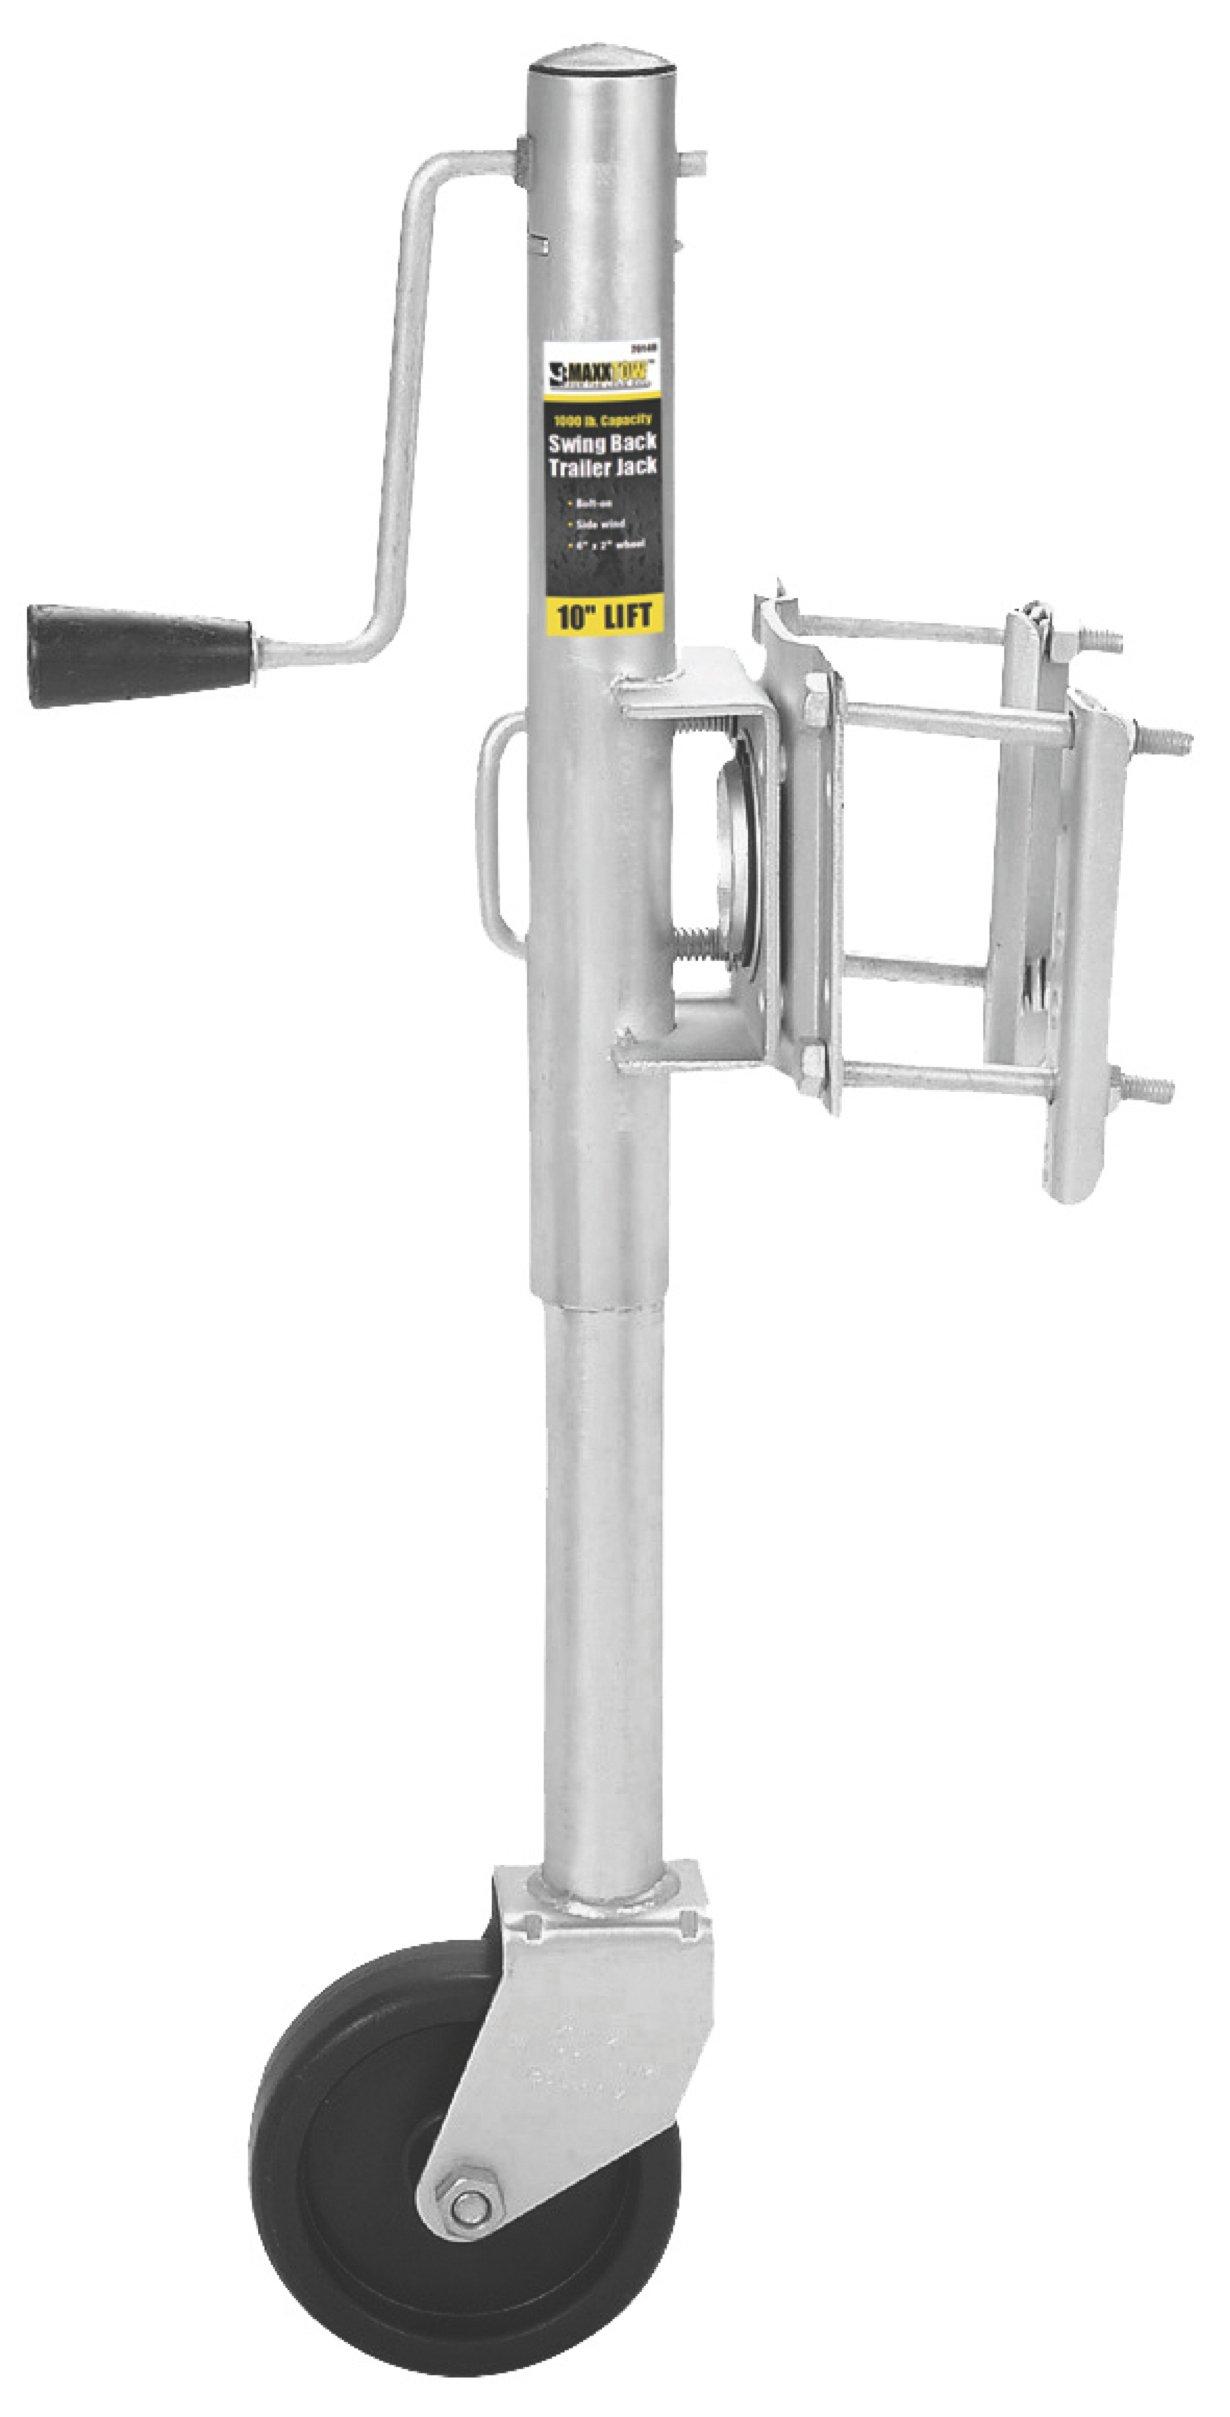 MaxxHaul 70148 10'' Lift Swing Back Trailer Jack with Single Wheel - 1000 lbs. Capacity by MaxxHaul